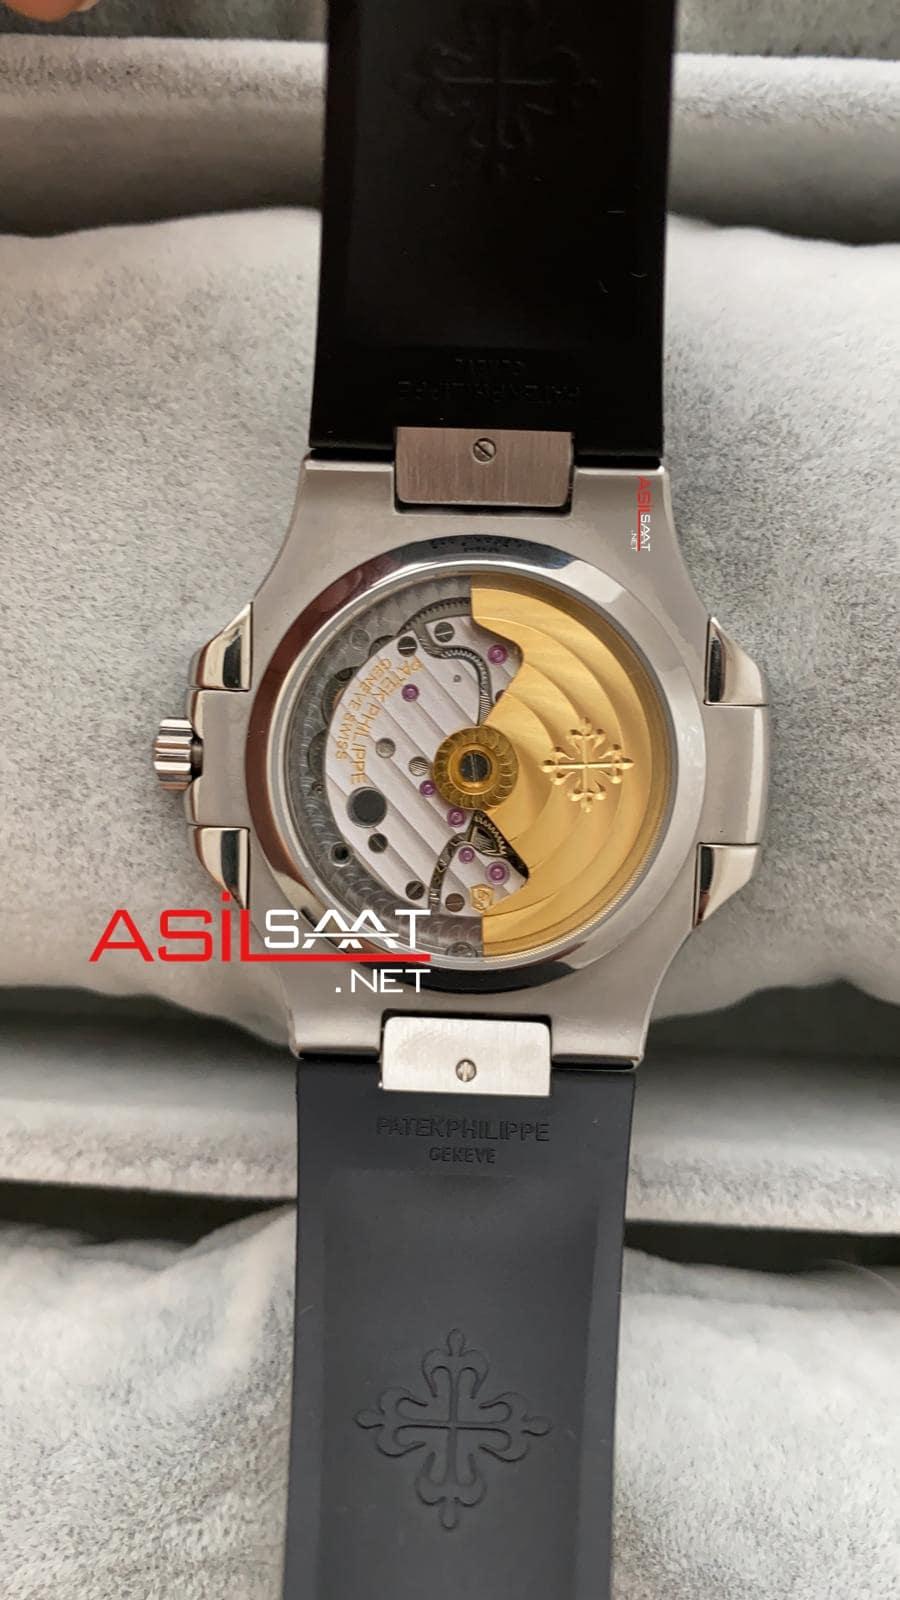 Patek Philippe Nautilus Silver İşlemeli Kasa Replika Saat PPNA033